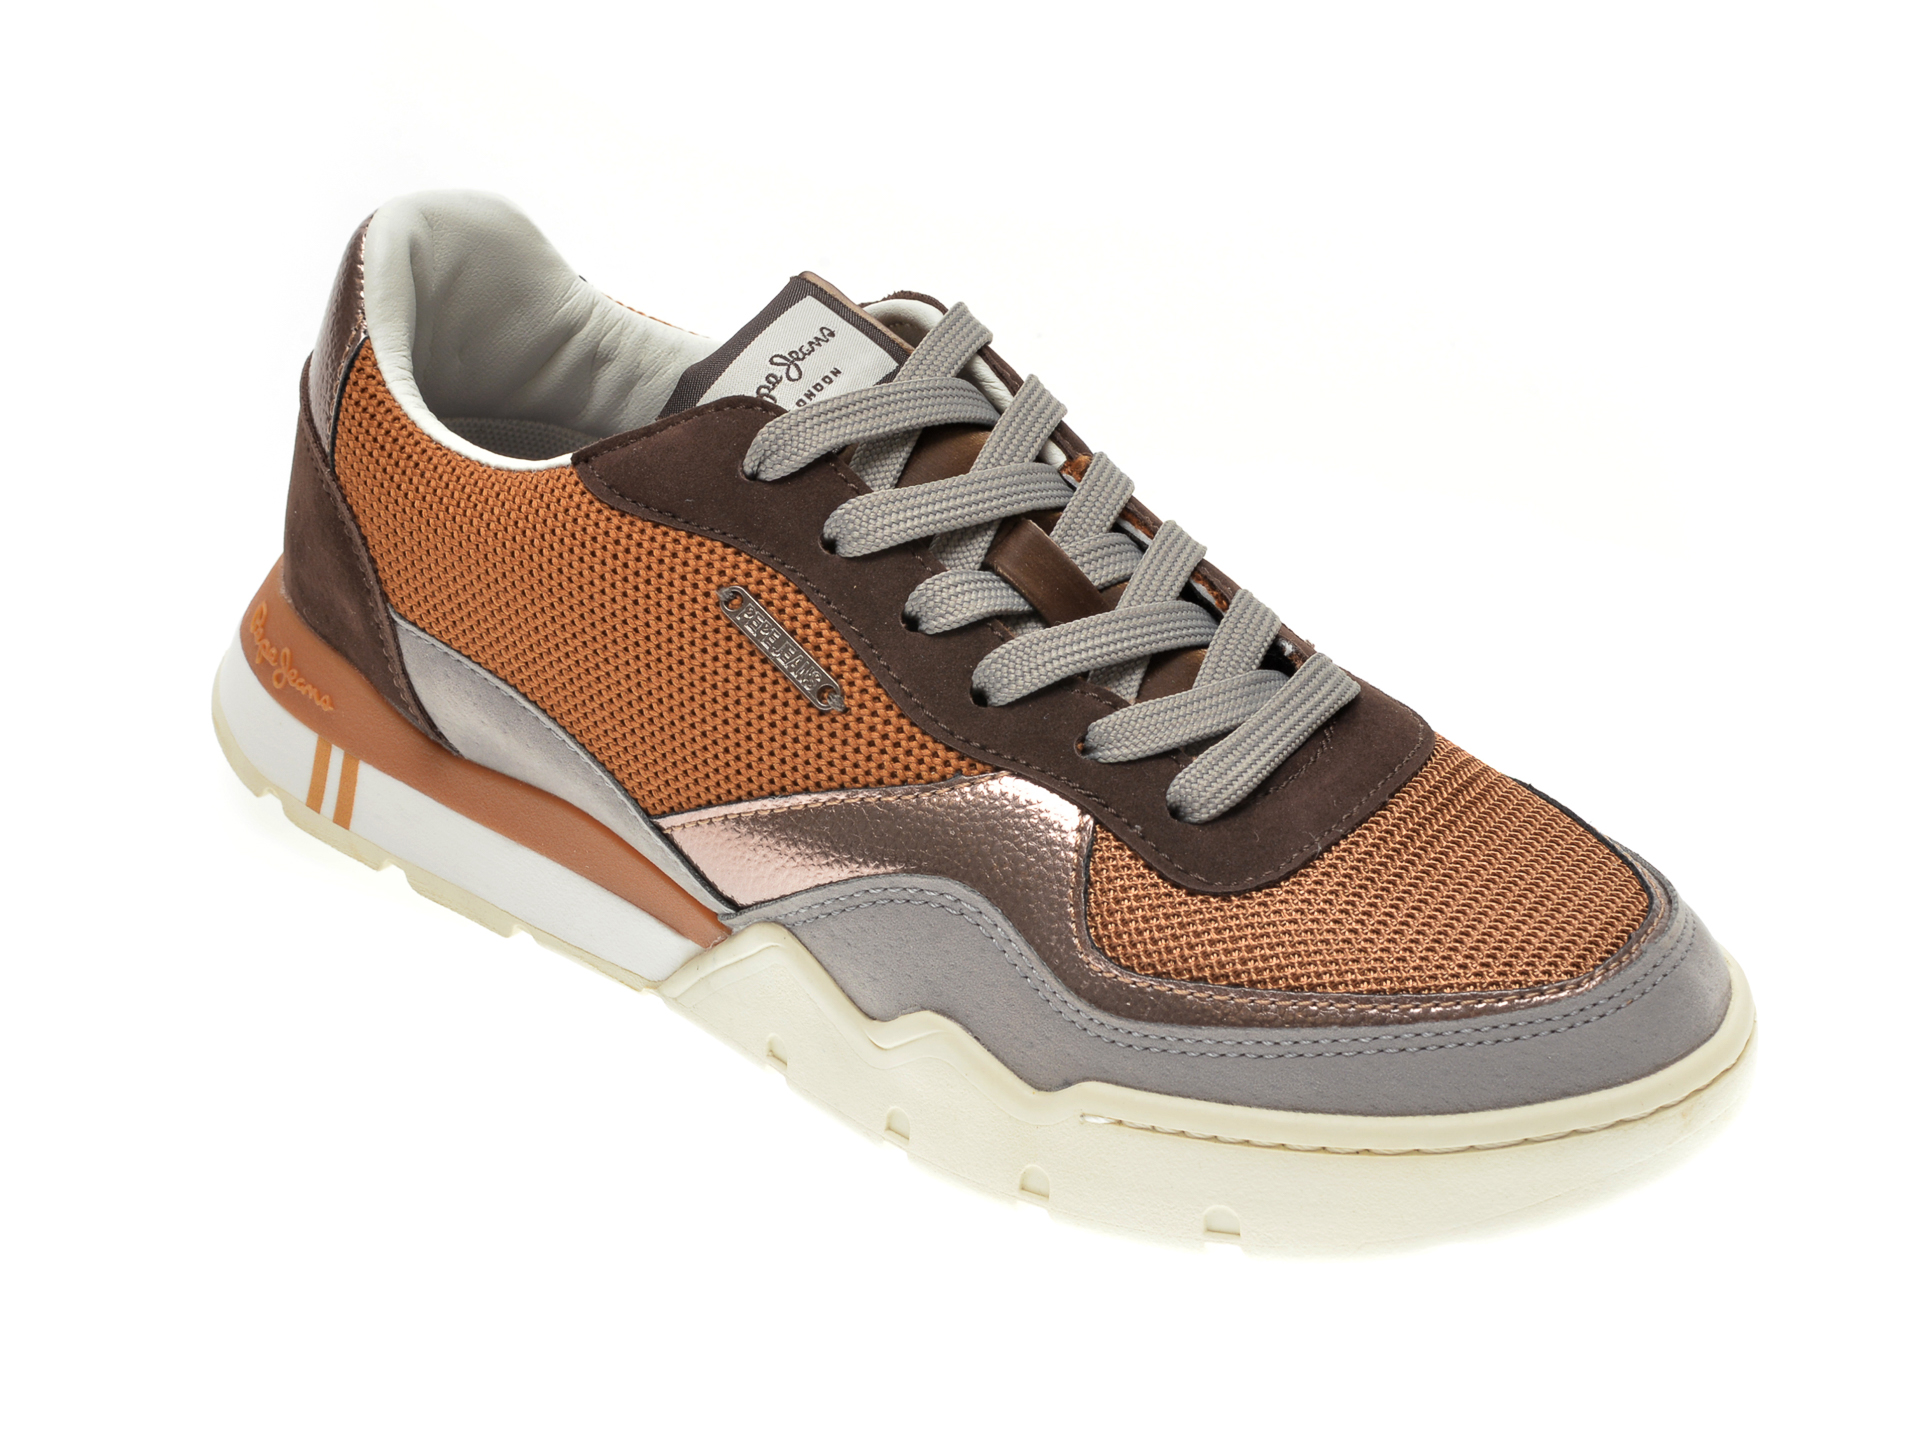 Pantofi sport PEPE JEANS maro, LS31029, din material textil si piele ecologica